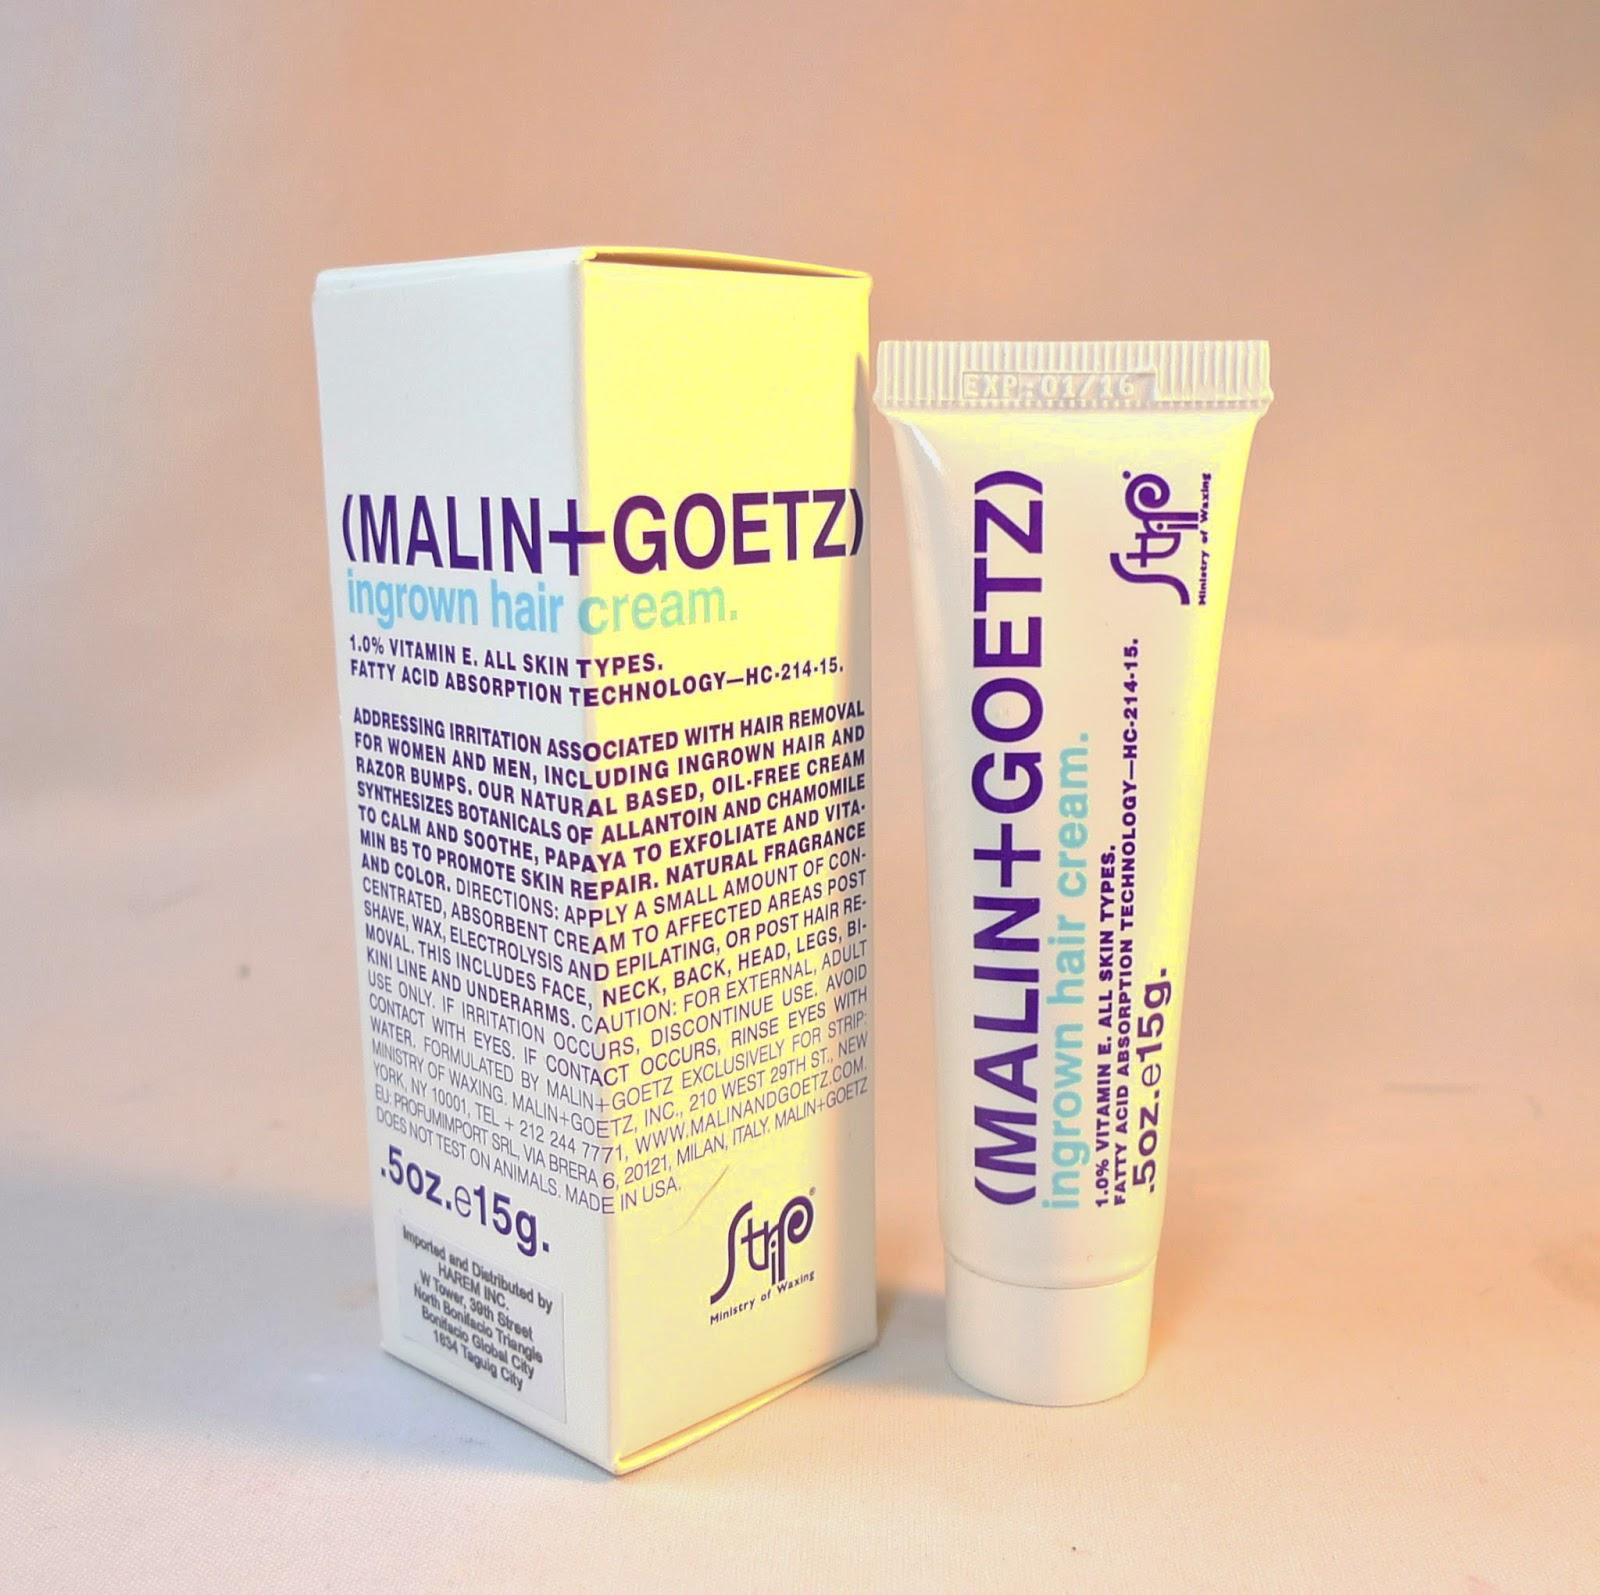 Malin+Goetz Ingrown Hair Cream Review | The Beauty Junkee